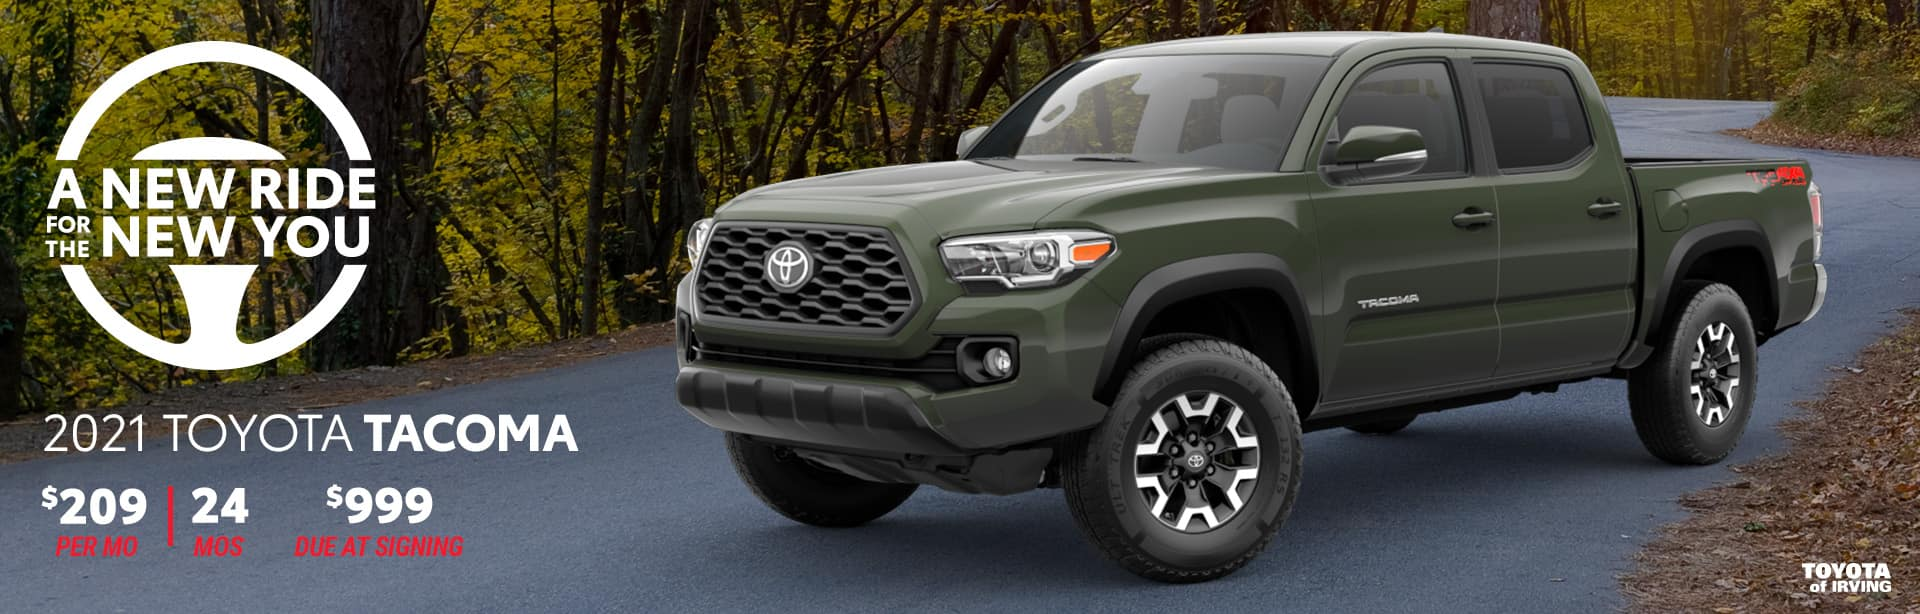 2021 Toyota Tacoma April Incentives